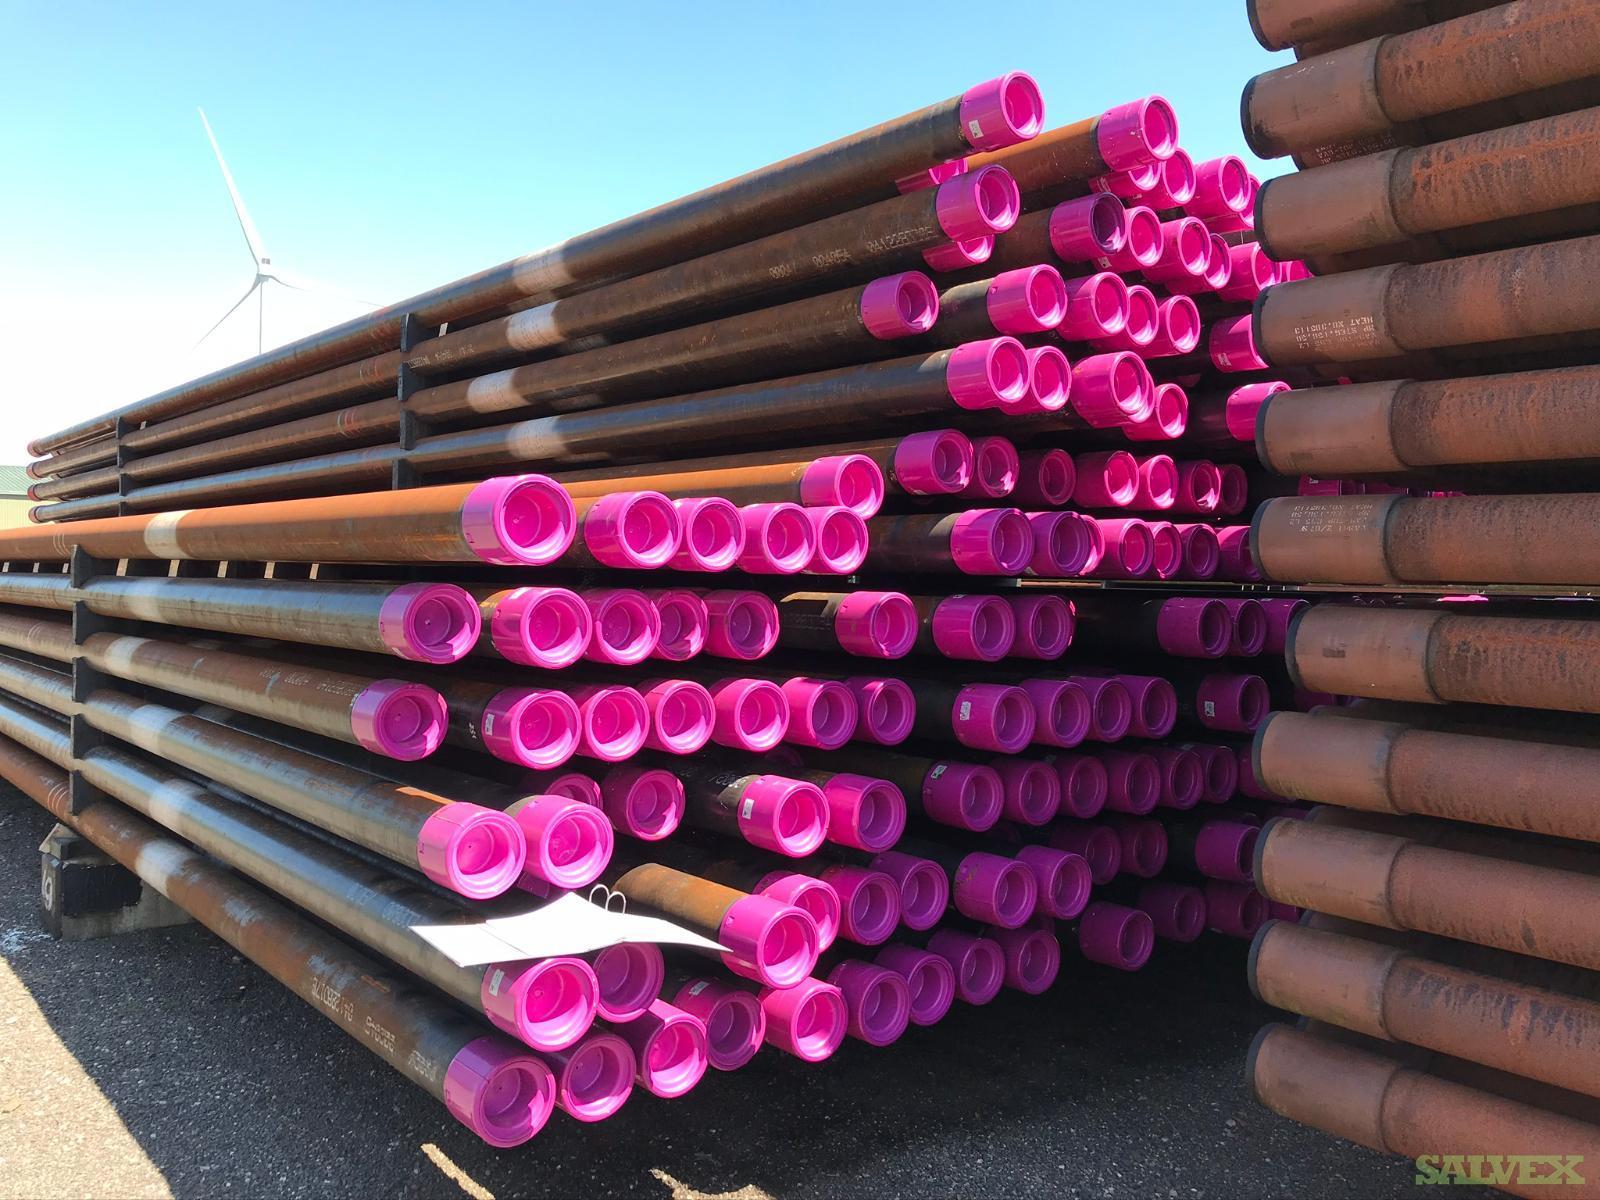 7 26# L80 VAM 21 R3 Surplus Casing (9,280 Feet / 109 Metric Tons)